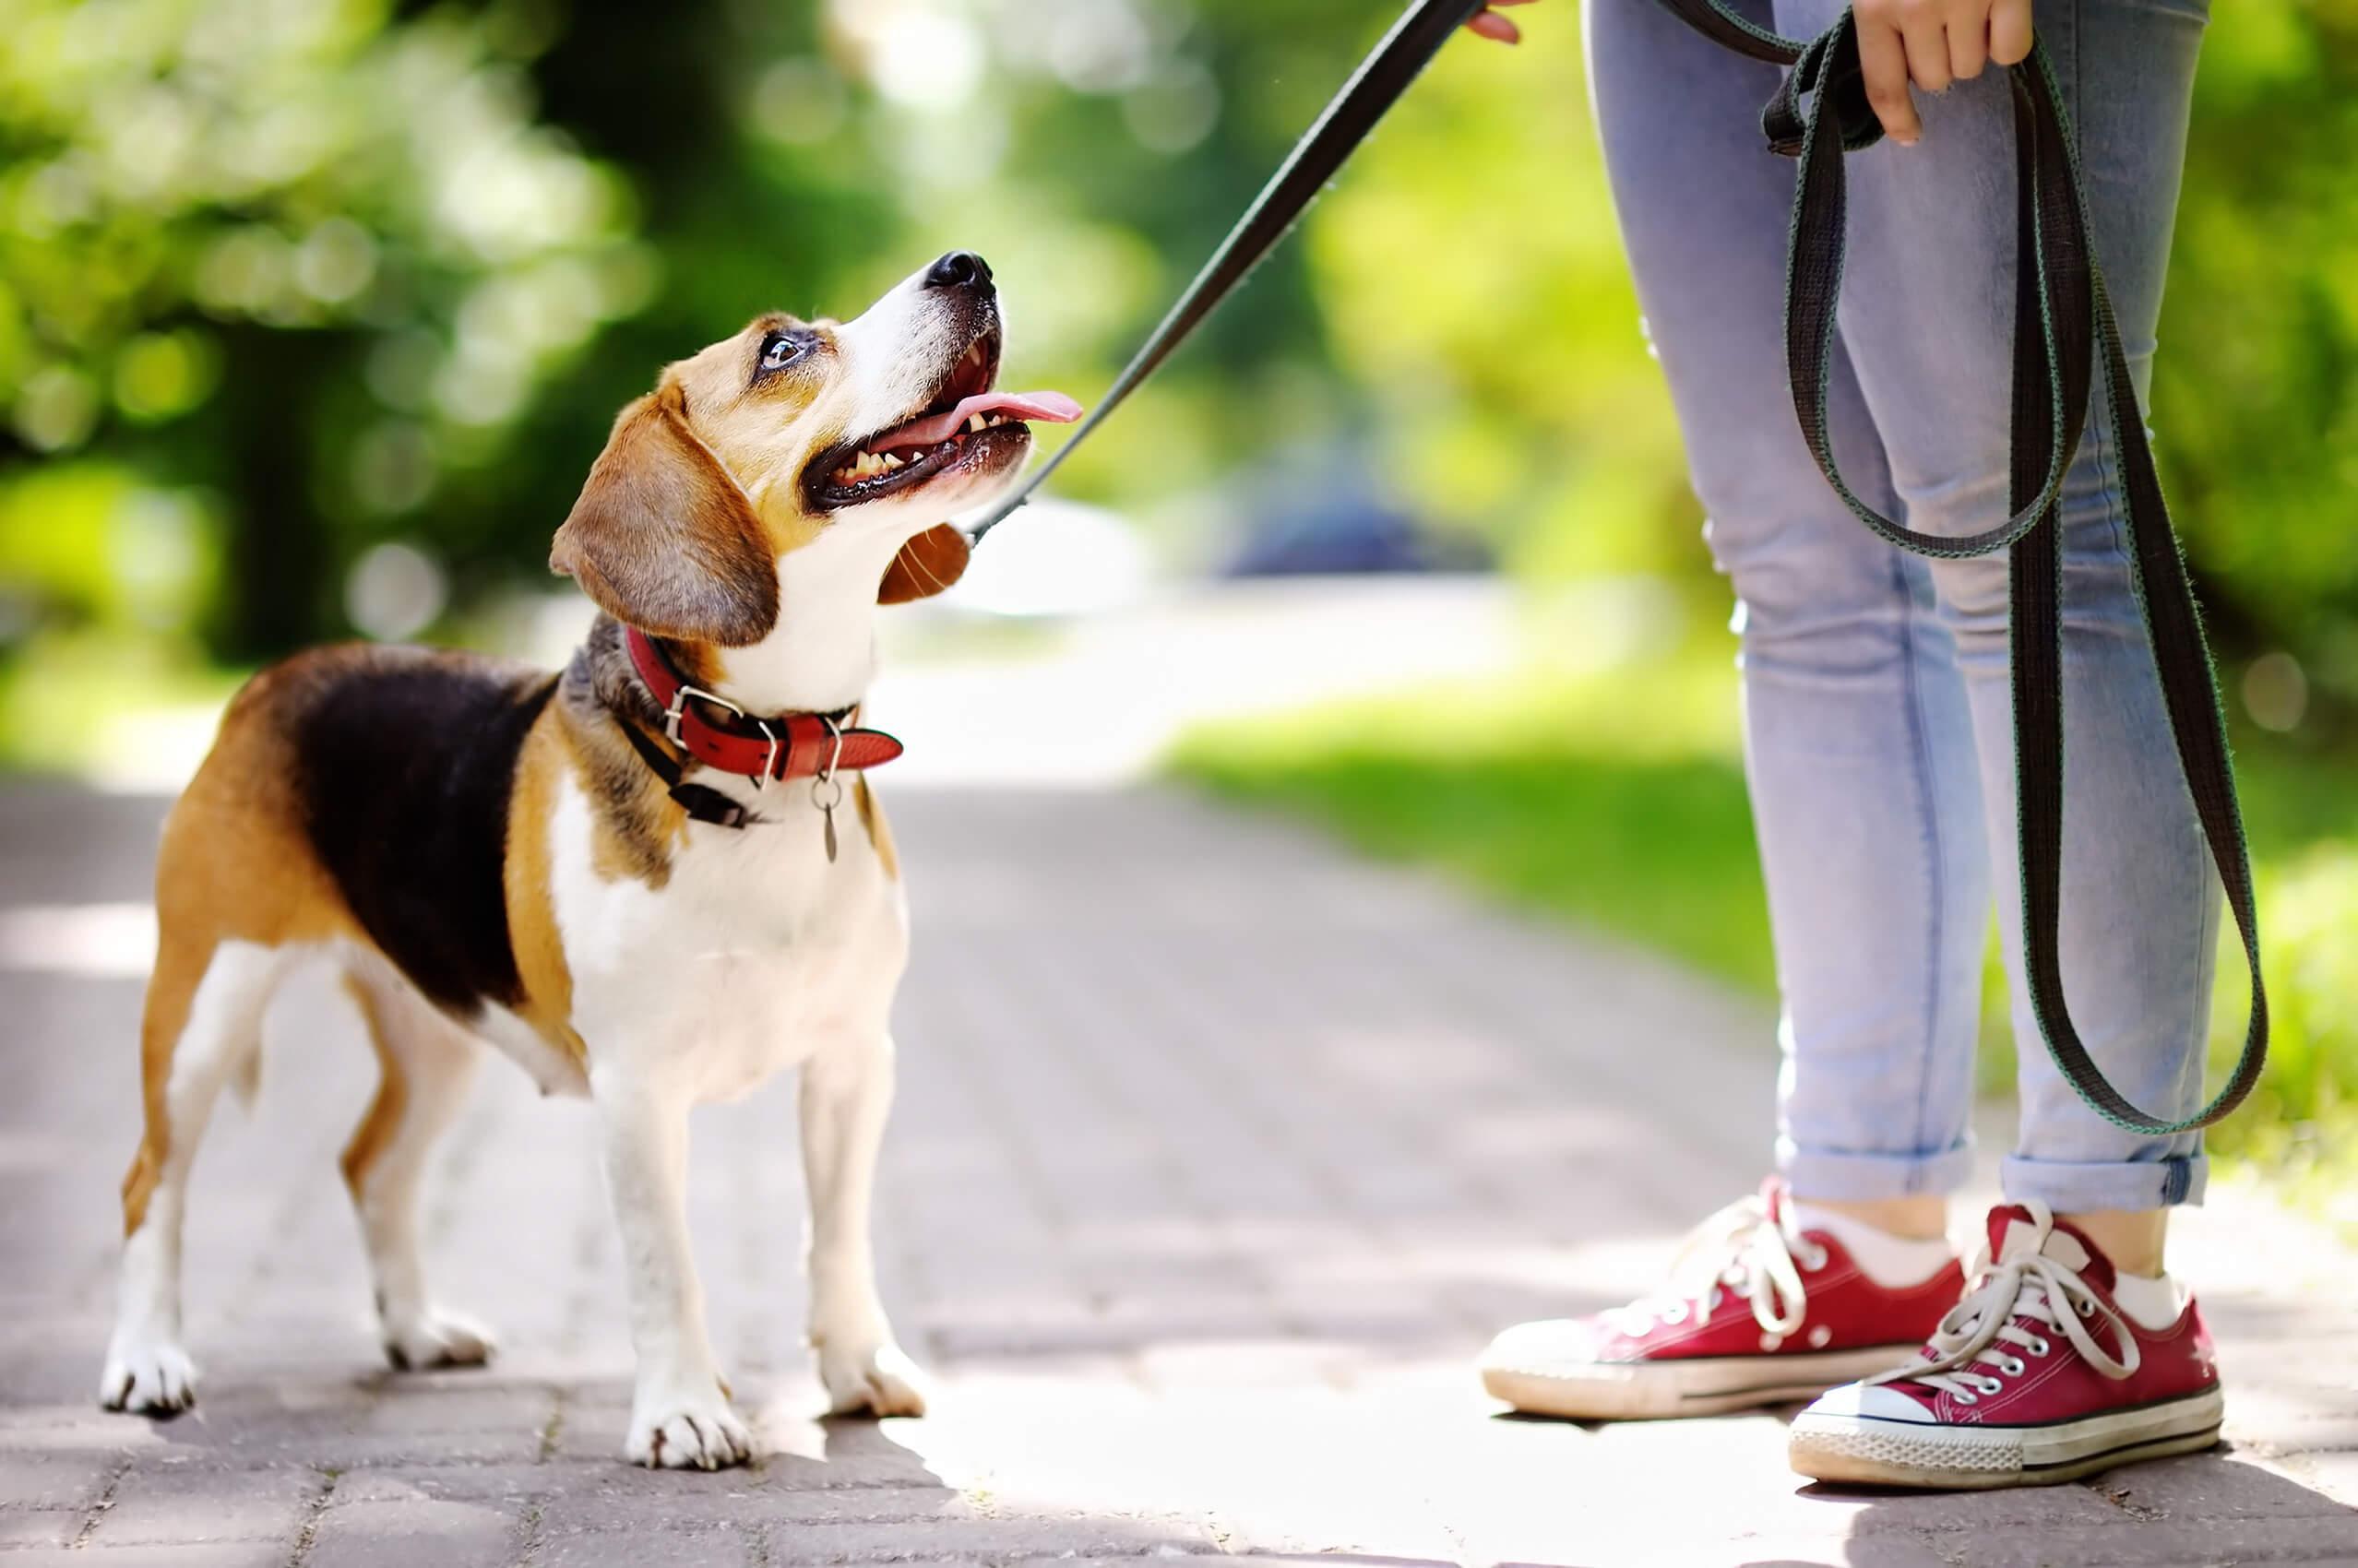 Beagle.jpeg#asset:9639